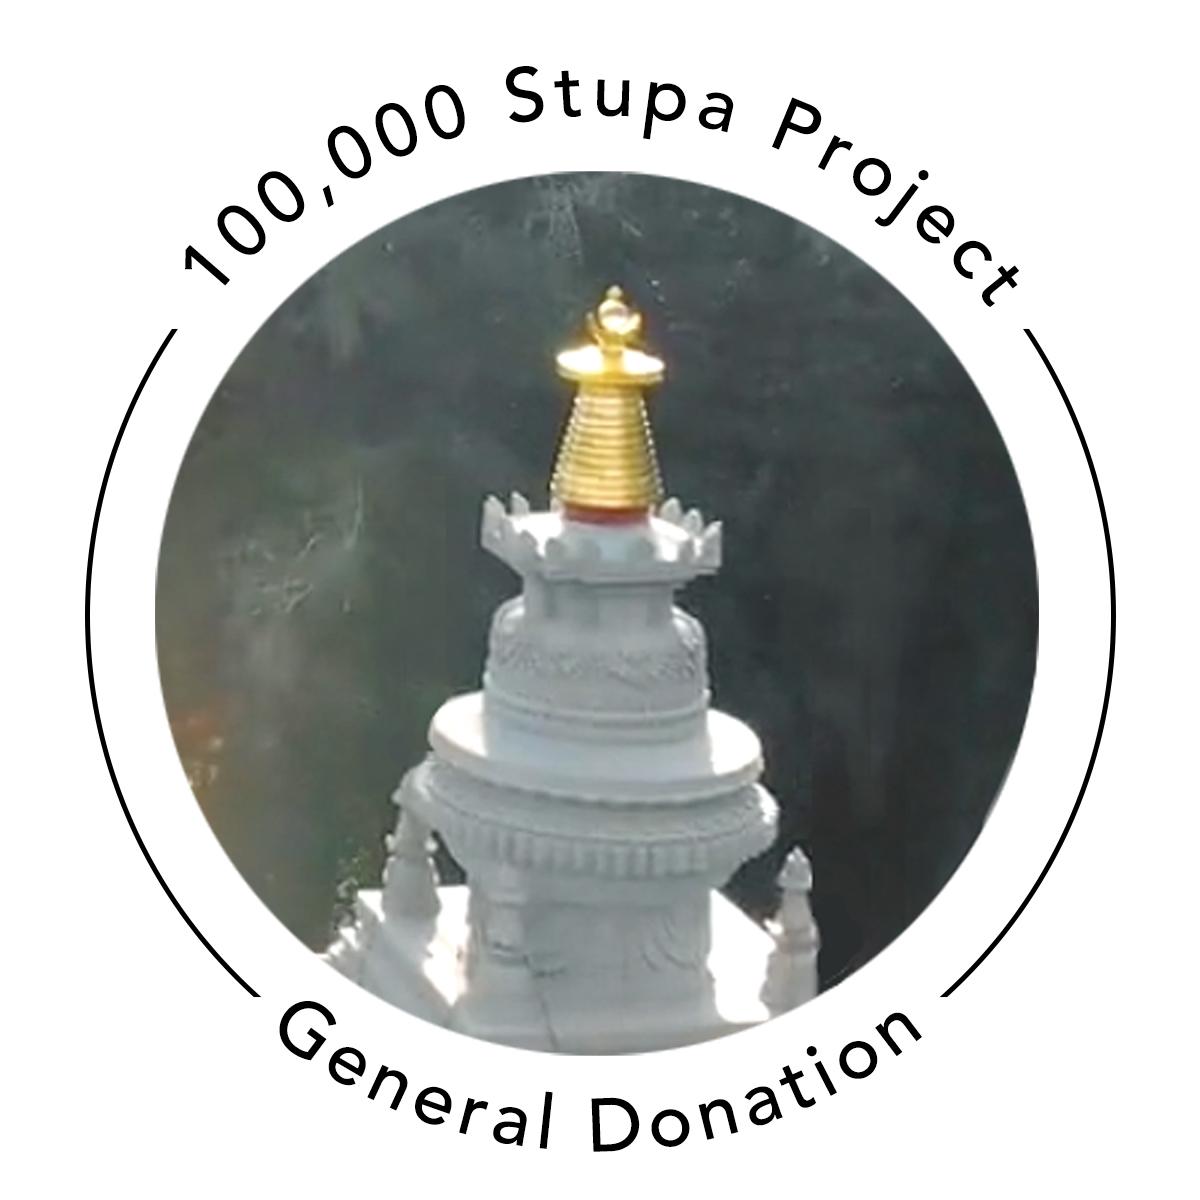 General Stupa Project Donations